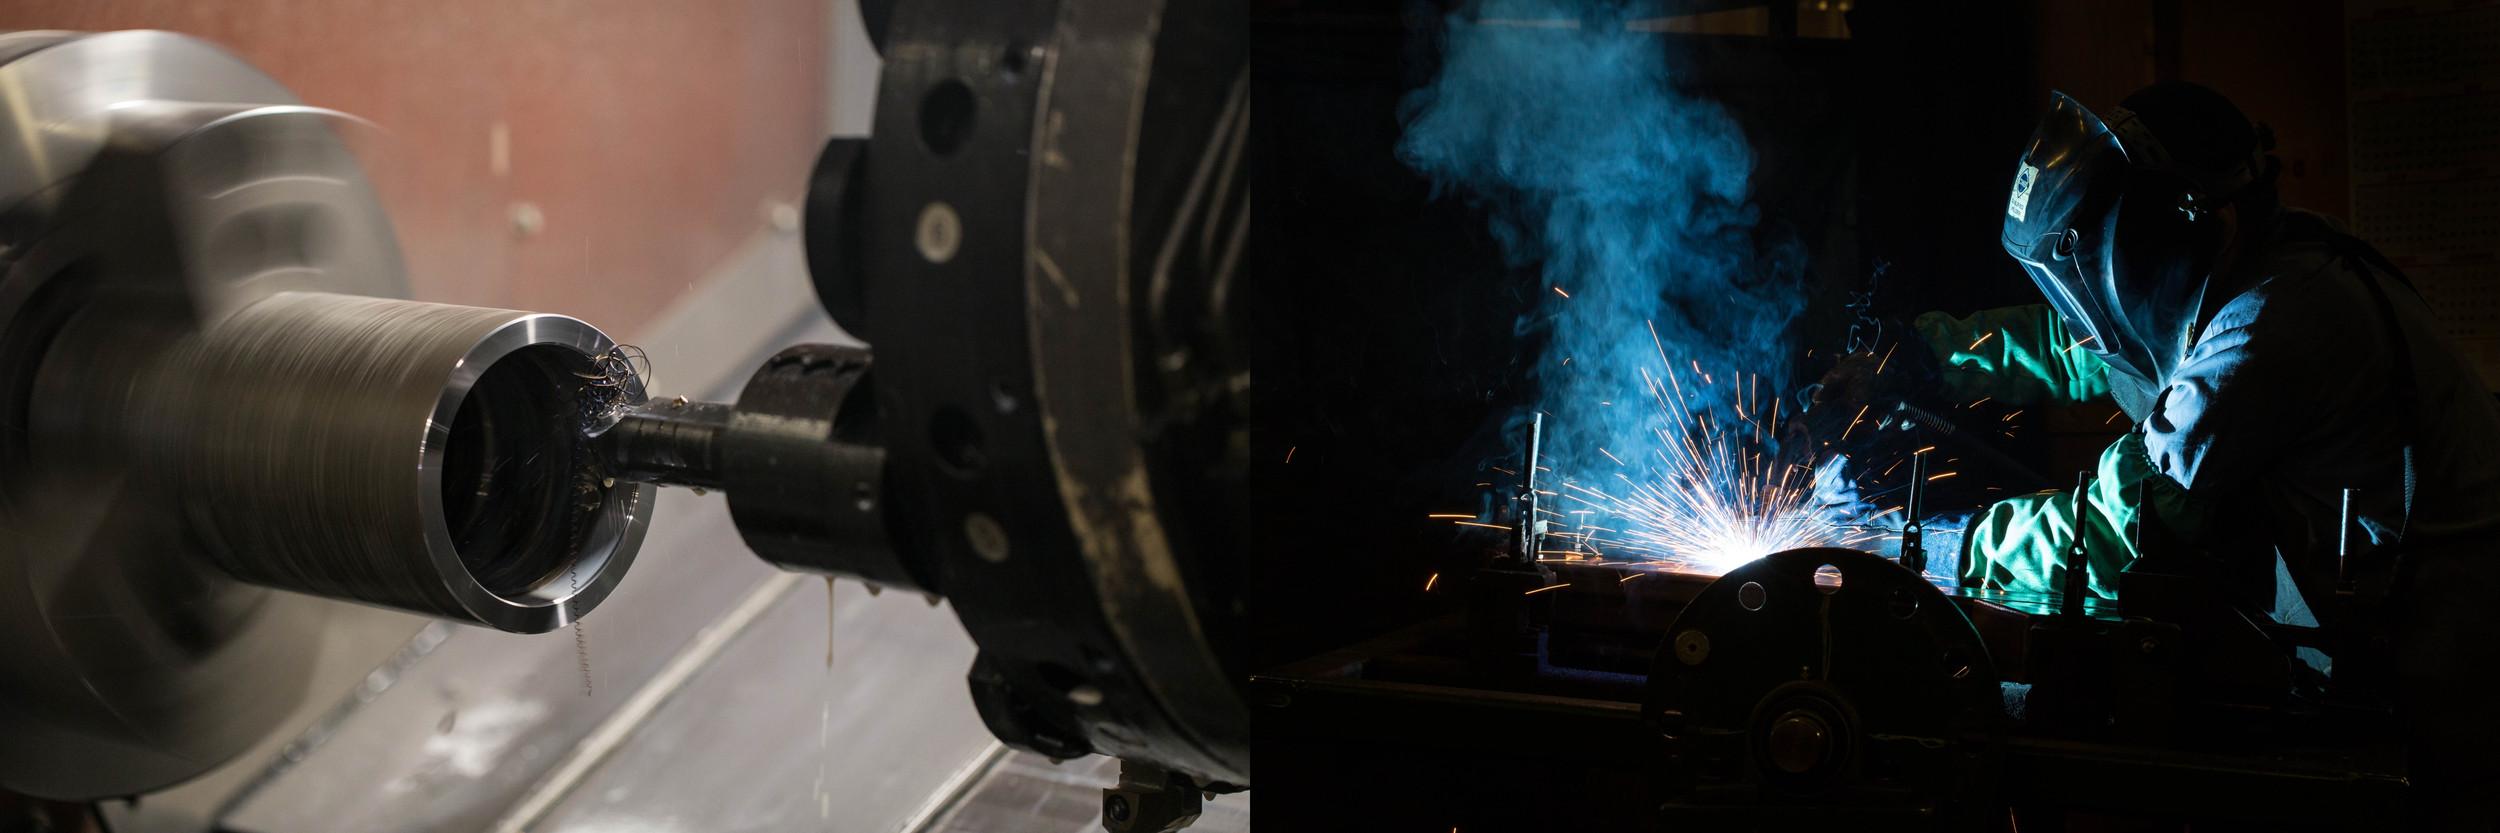 Custom Manufacturing and Machining | Thor Manufacturing | Canada